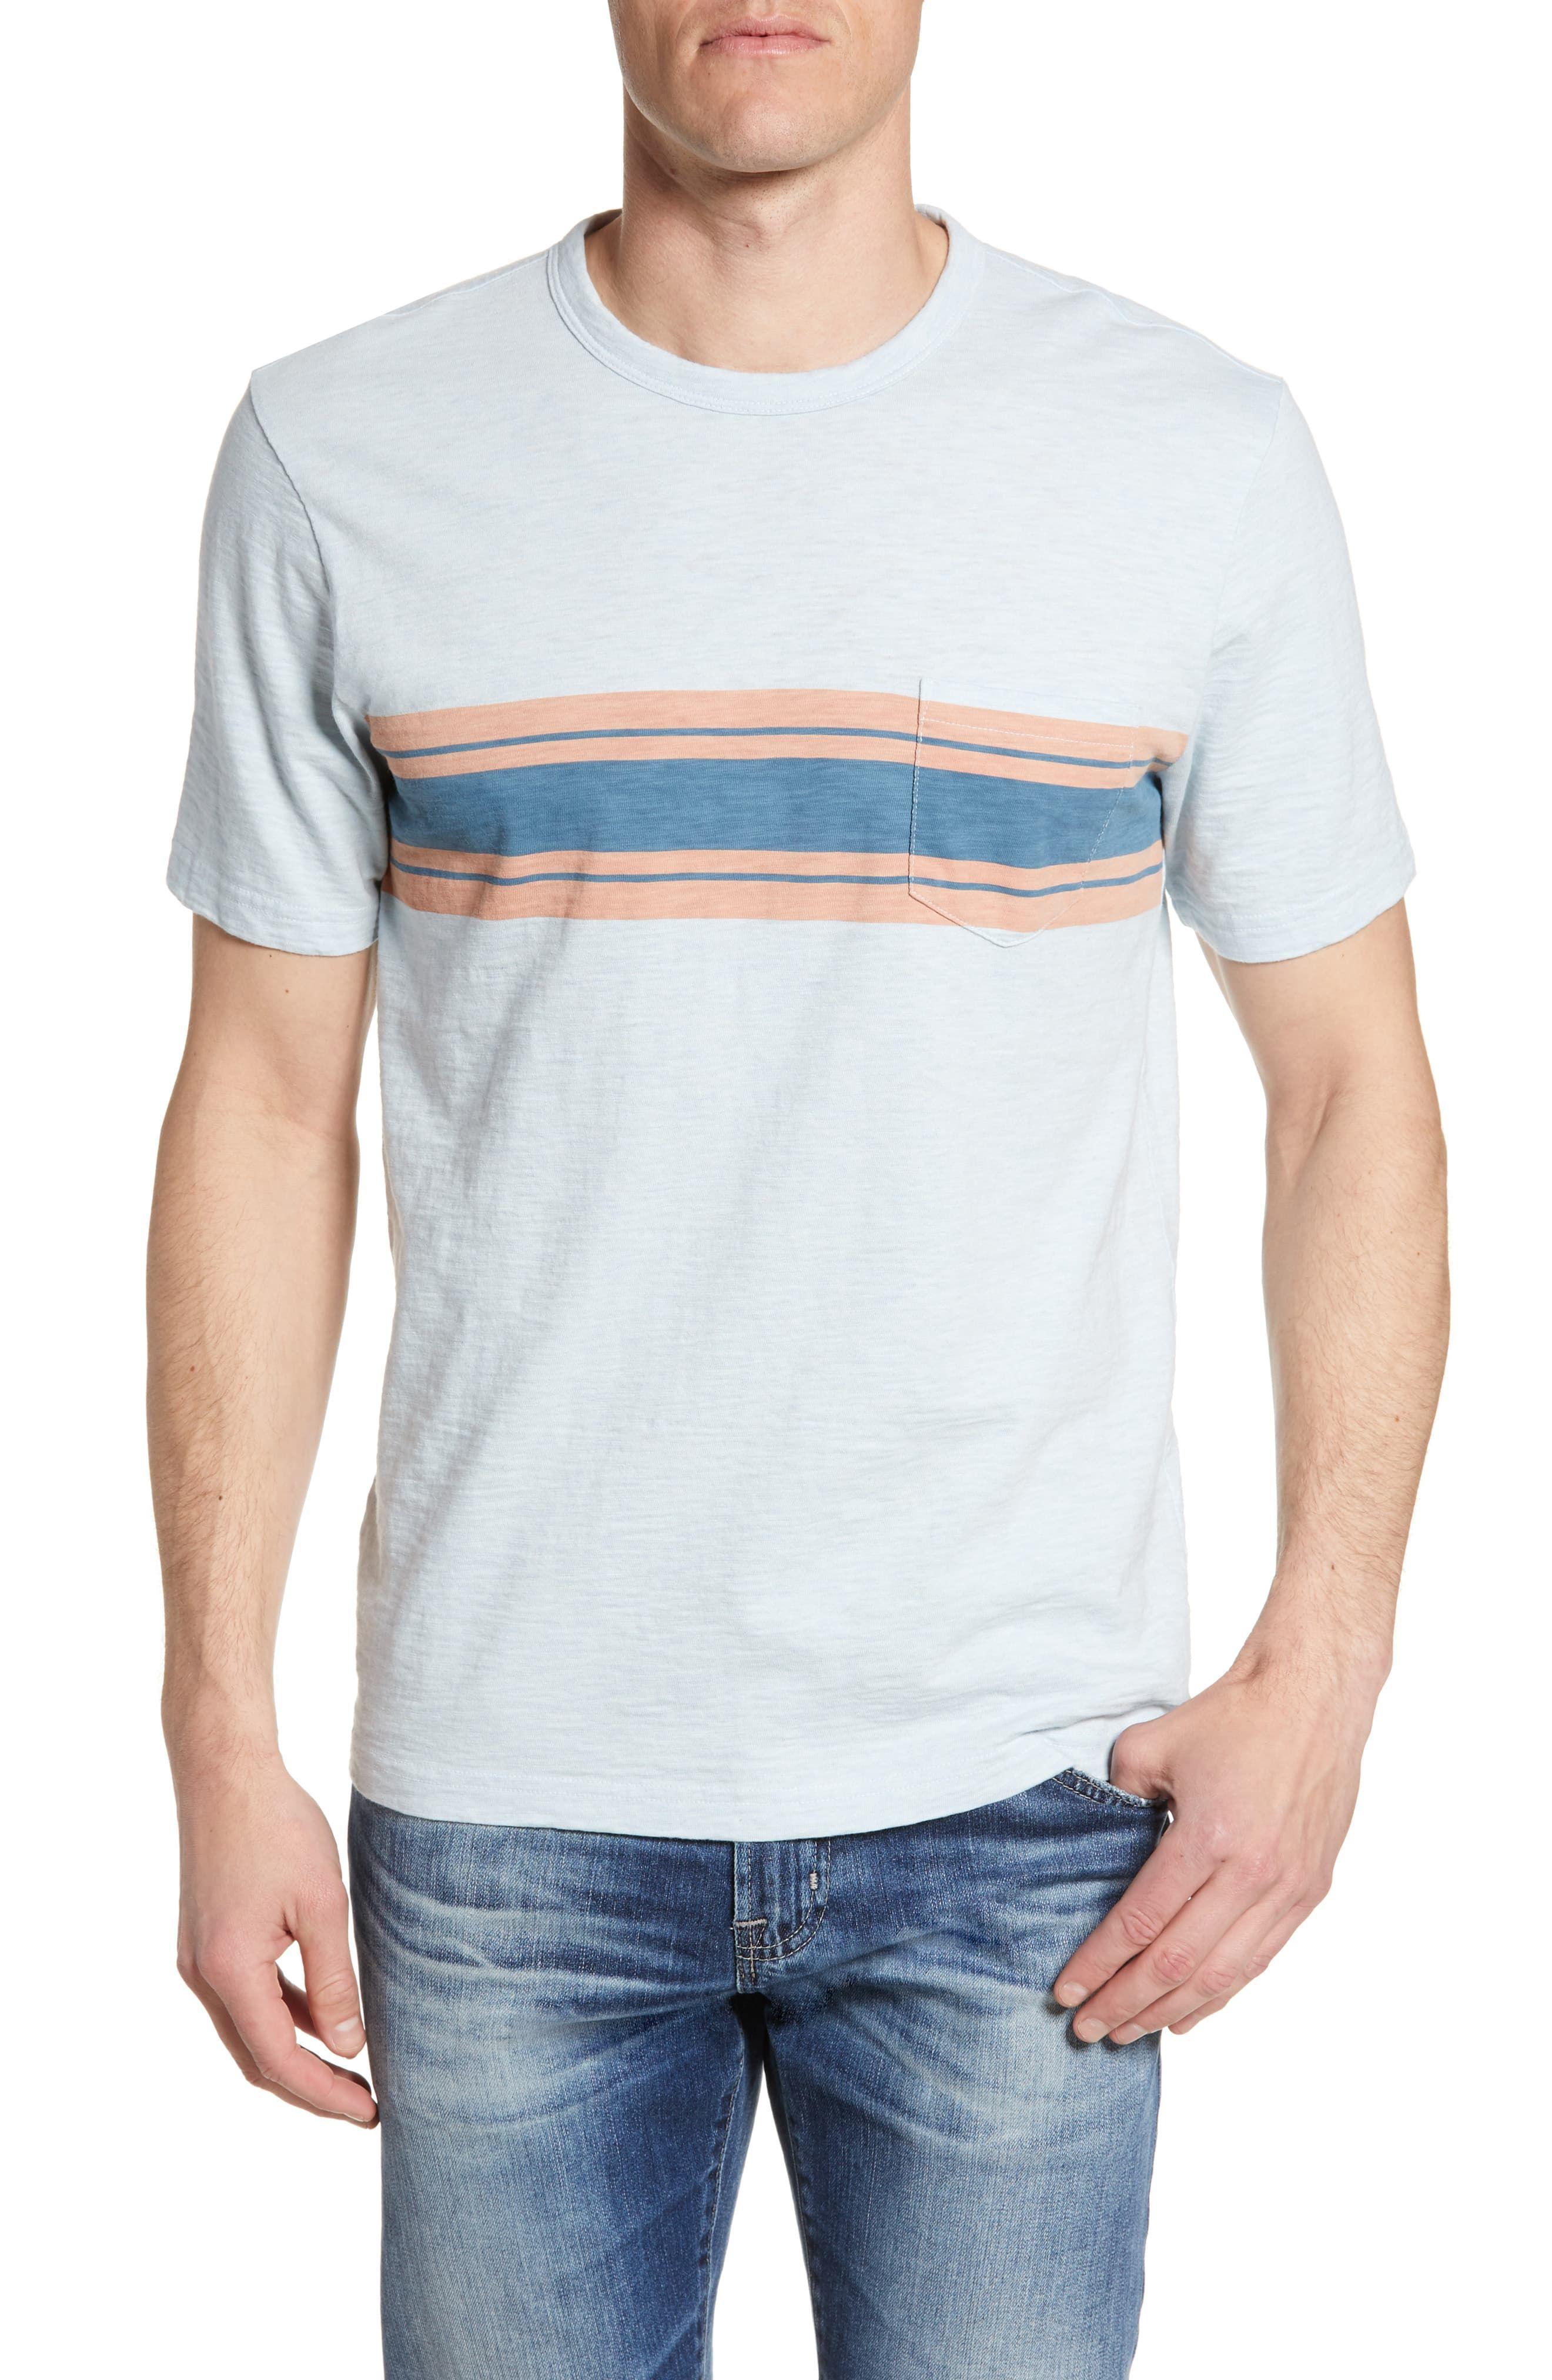 1b419286f3 Faherty Surf Stripe Pocket T-Shirt in 2019 | Products | T shirt, Cut ...